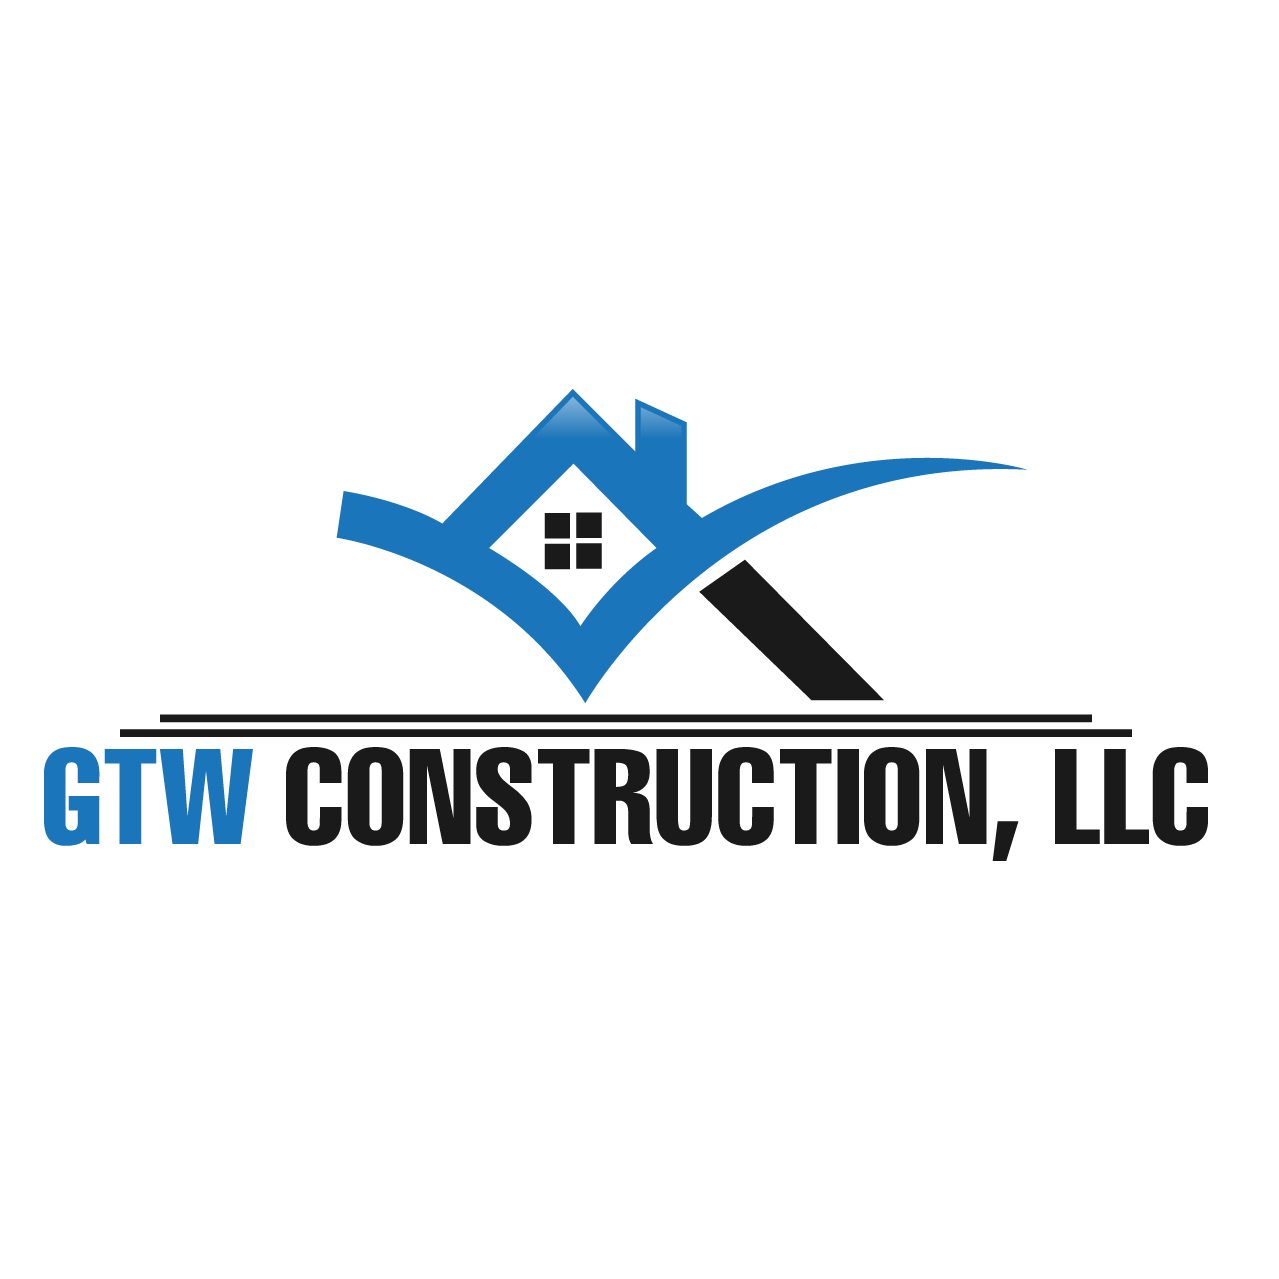 GTW Construction, LLC